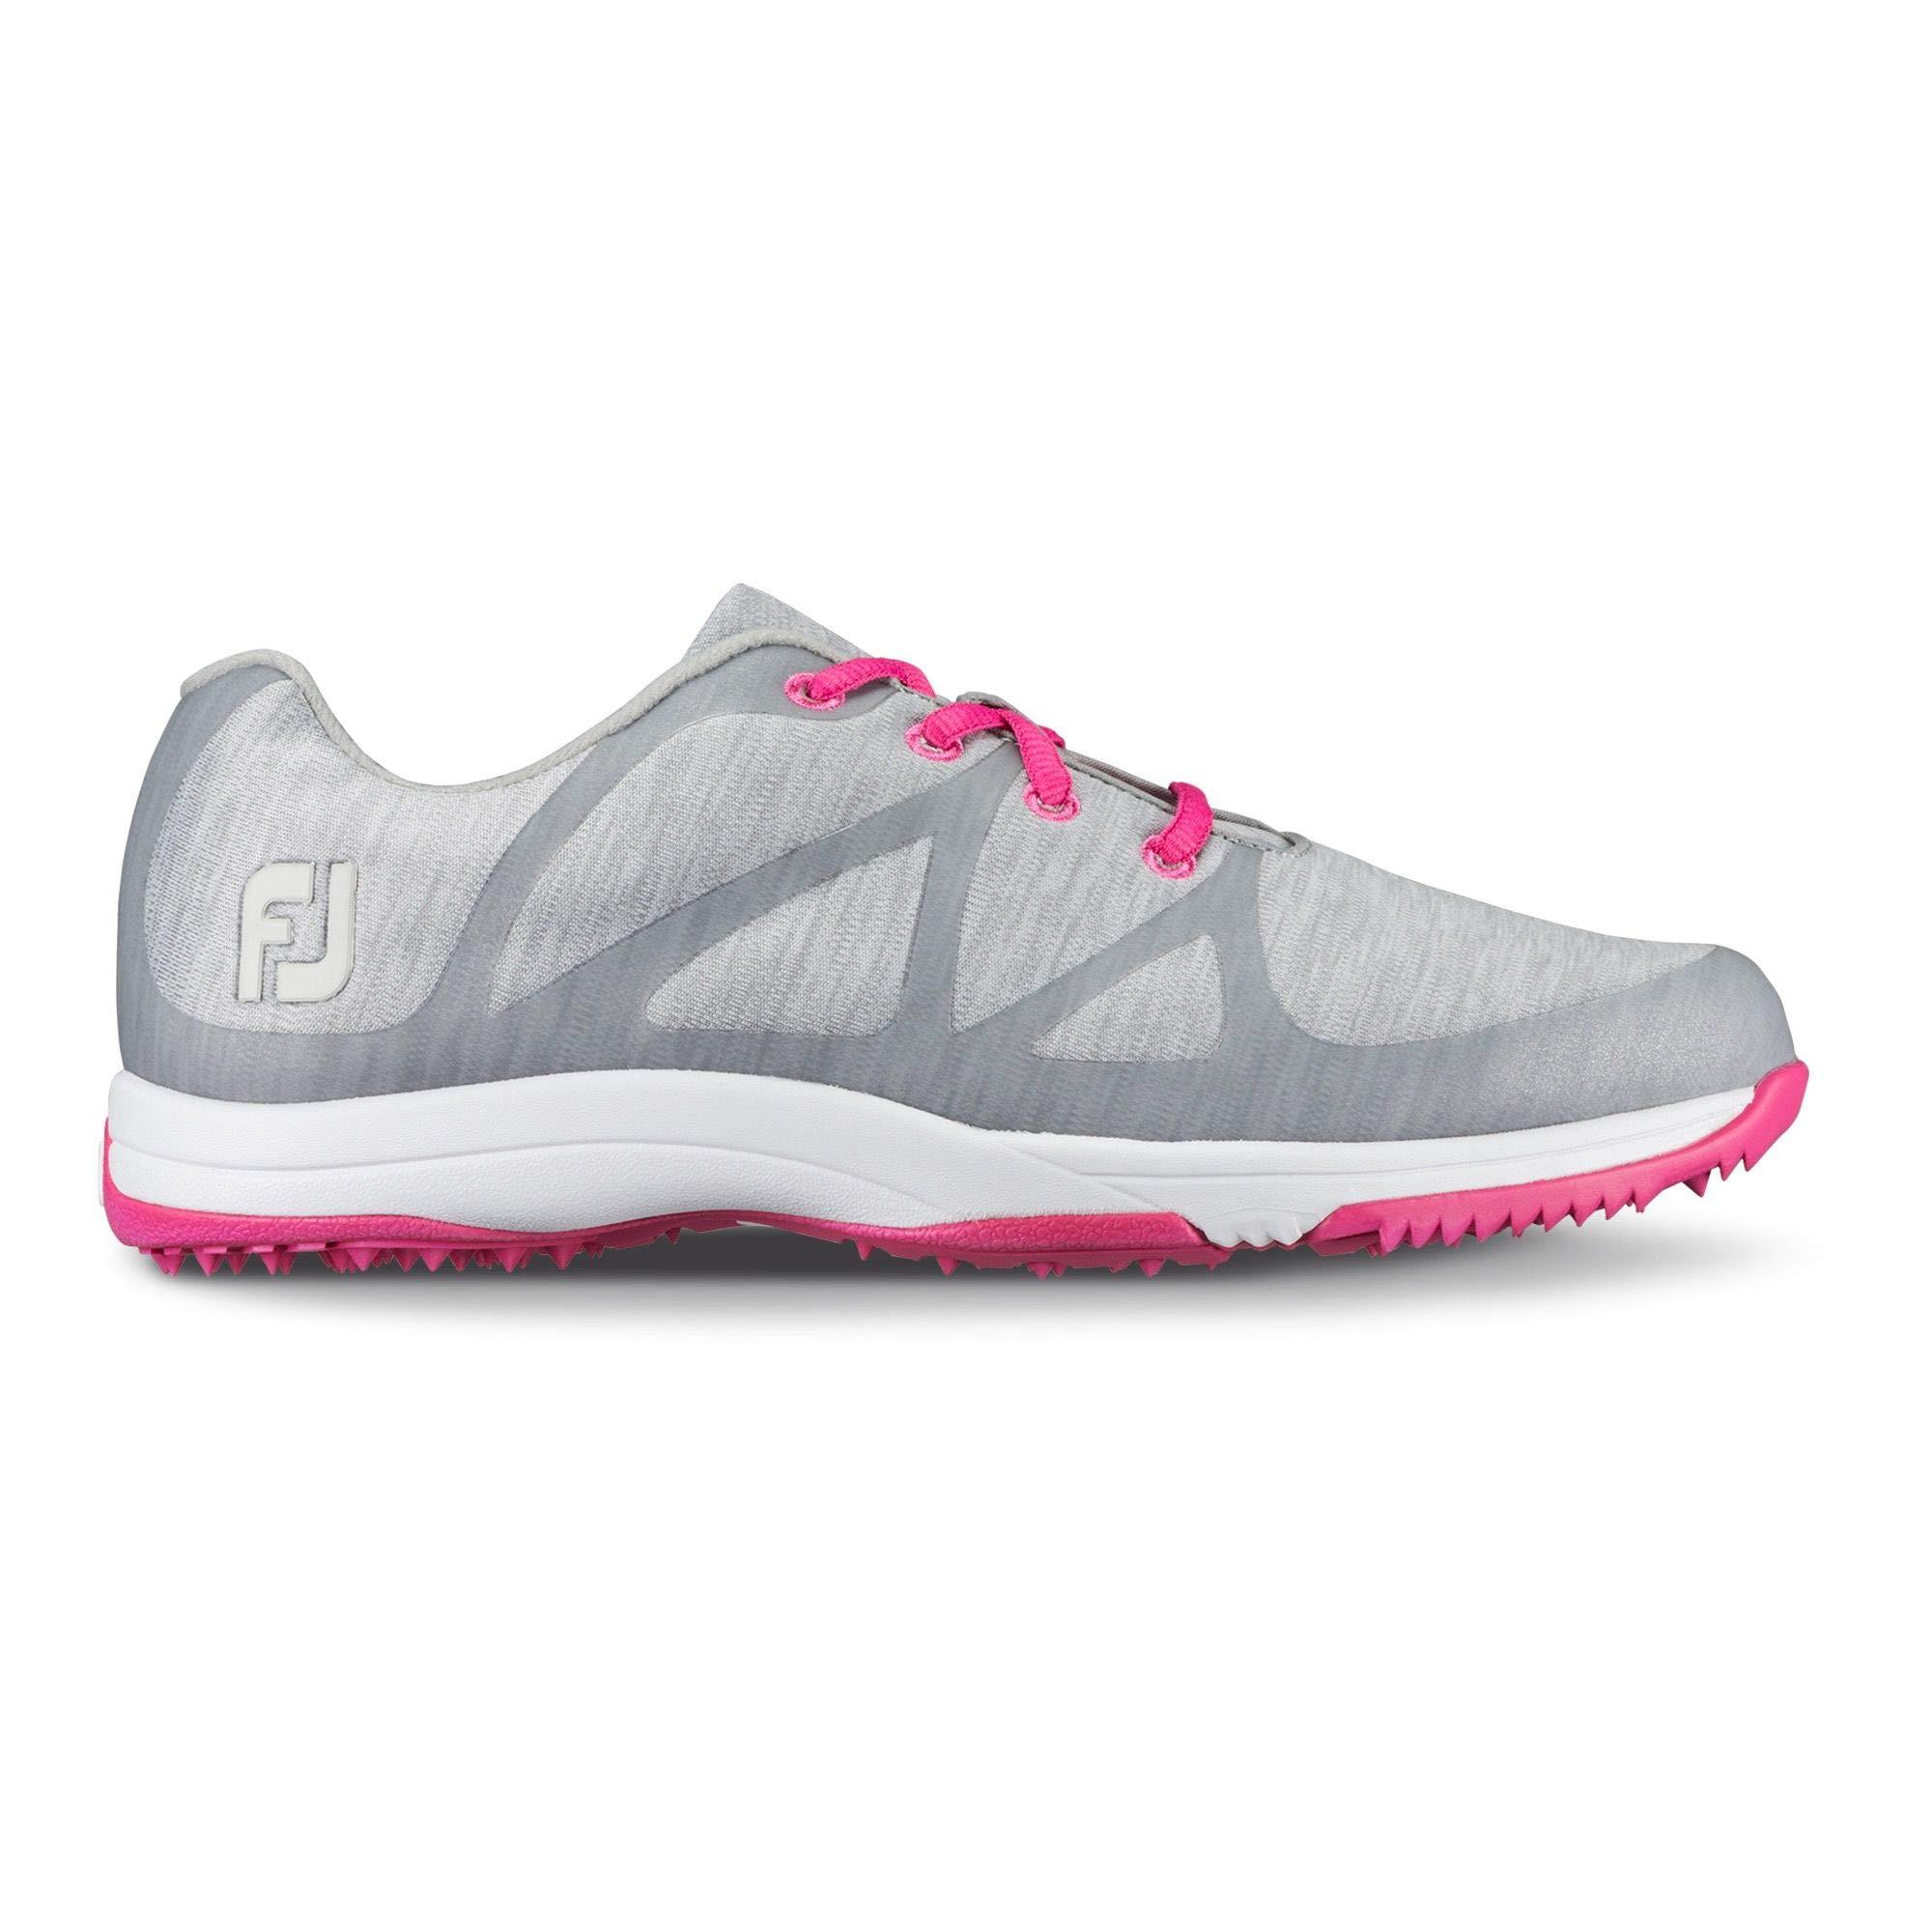 FootJoy Women's Leisure-Previous Season Style Golf Shoes Grey 8.5 M, Light US by FootJoy